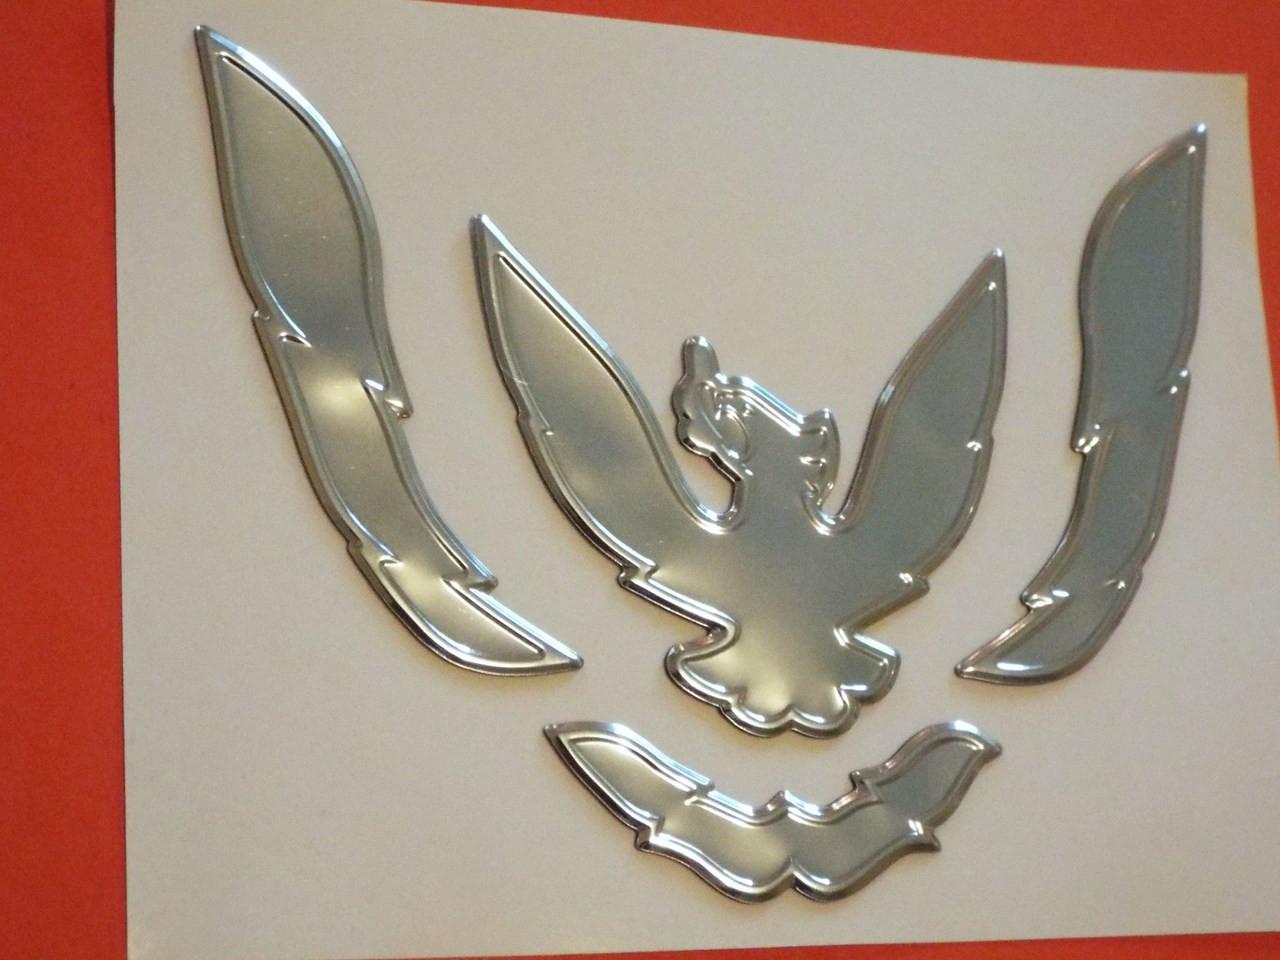 New 1993-1994-1995-1996-1997 Pontiac Firebird Bumper Emblem-Badge-Chrome New 1993-1994-1995-1996-1997  Pontiac Trans Am Bumper Emblem-Badge-Chrome New 1993-1994-1995-1996-1997  Pontiac Trans Am Nose Emblem-Badge-Chrome New 1993-1994-1995-1996-1997 Pontiac Firebird Nose Emblem-Badge-Chrome